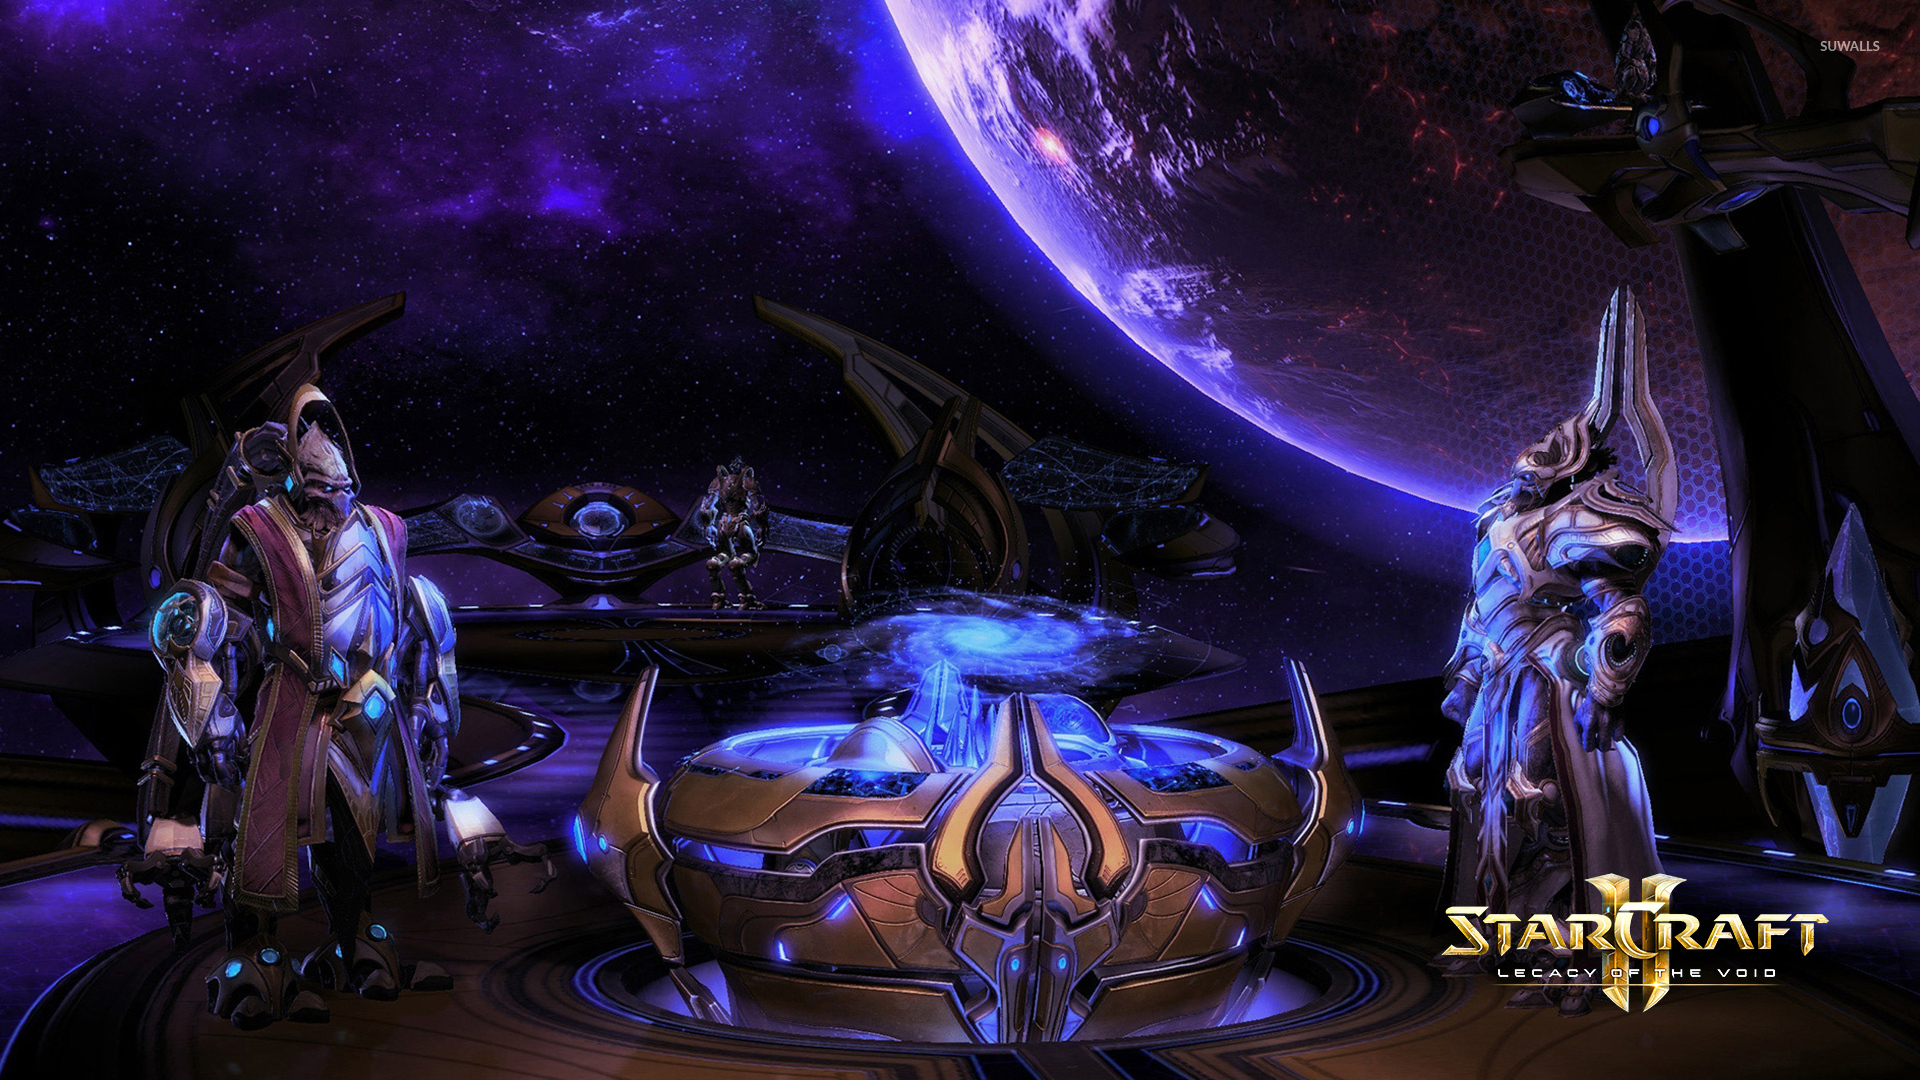 Starcraft 2 Wallpapers Artanis